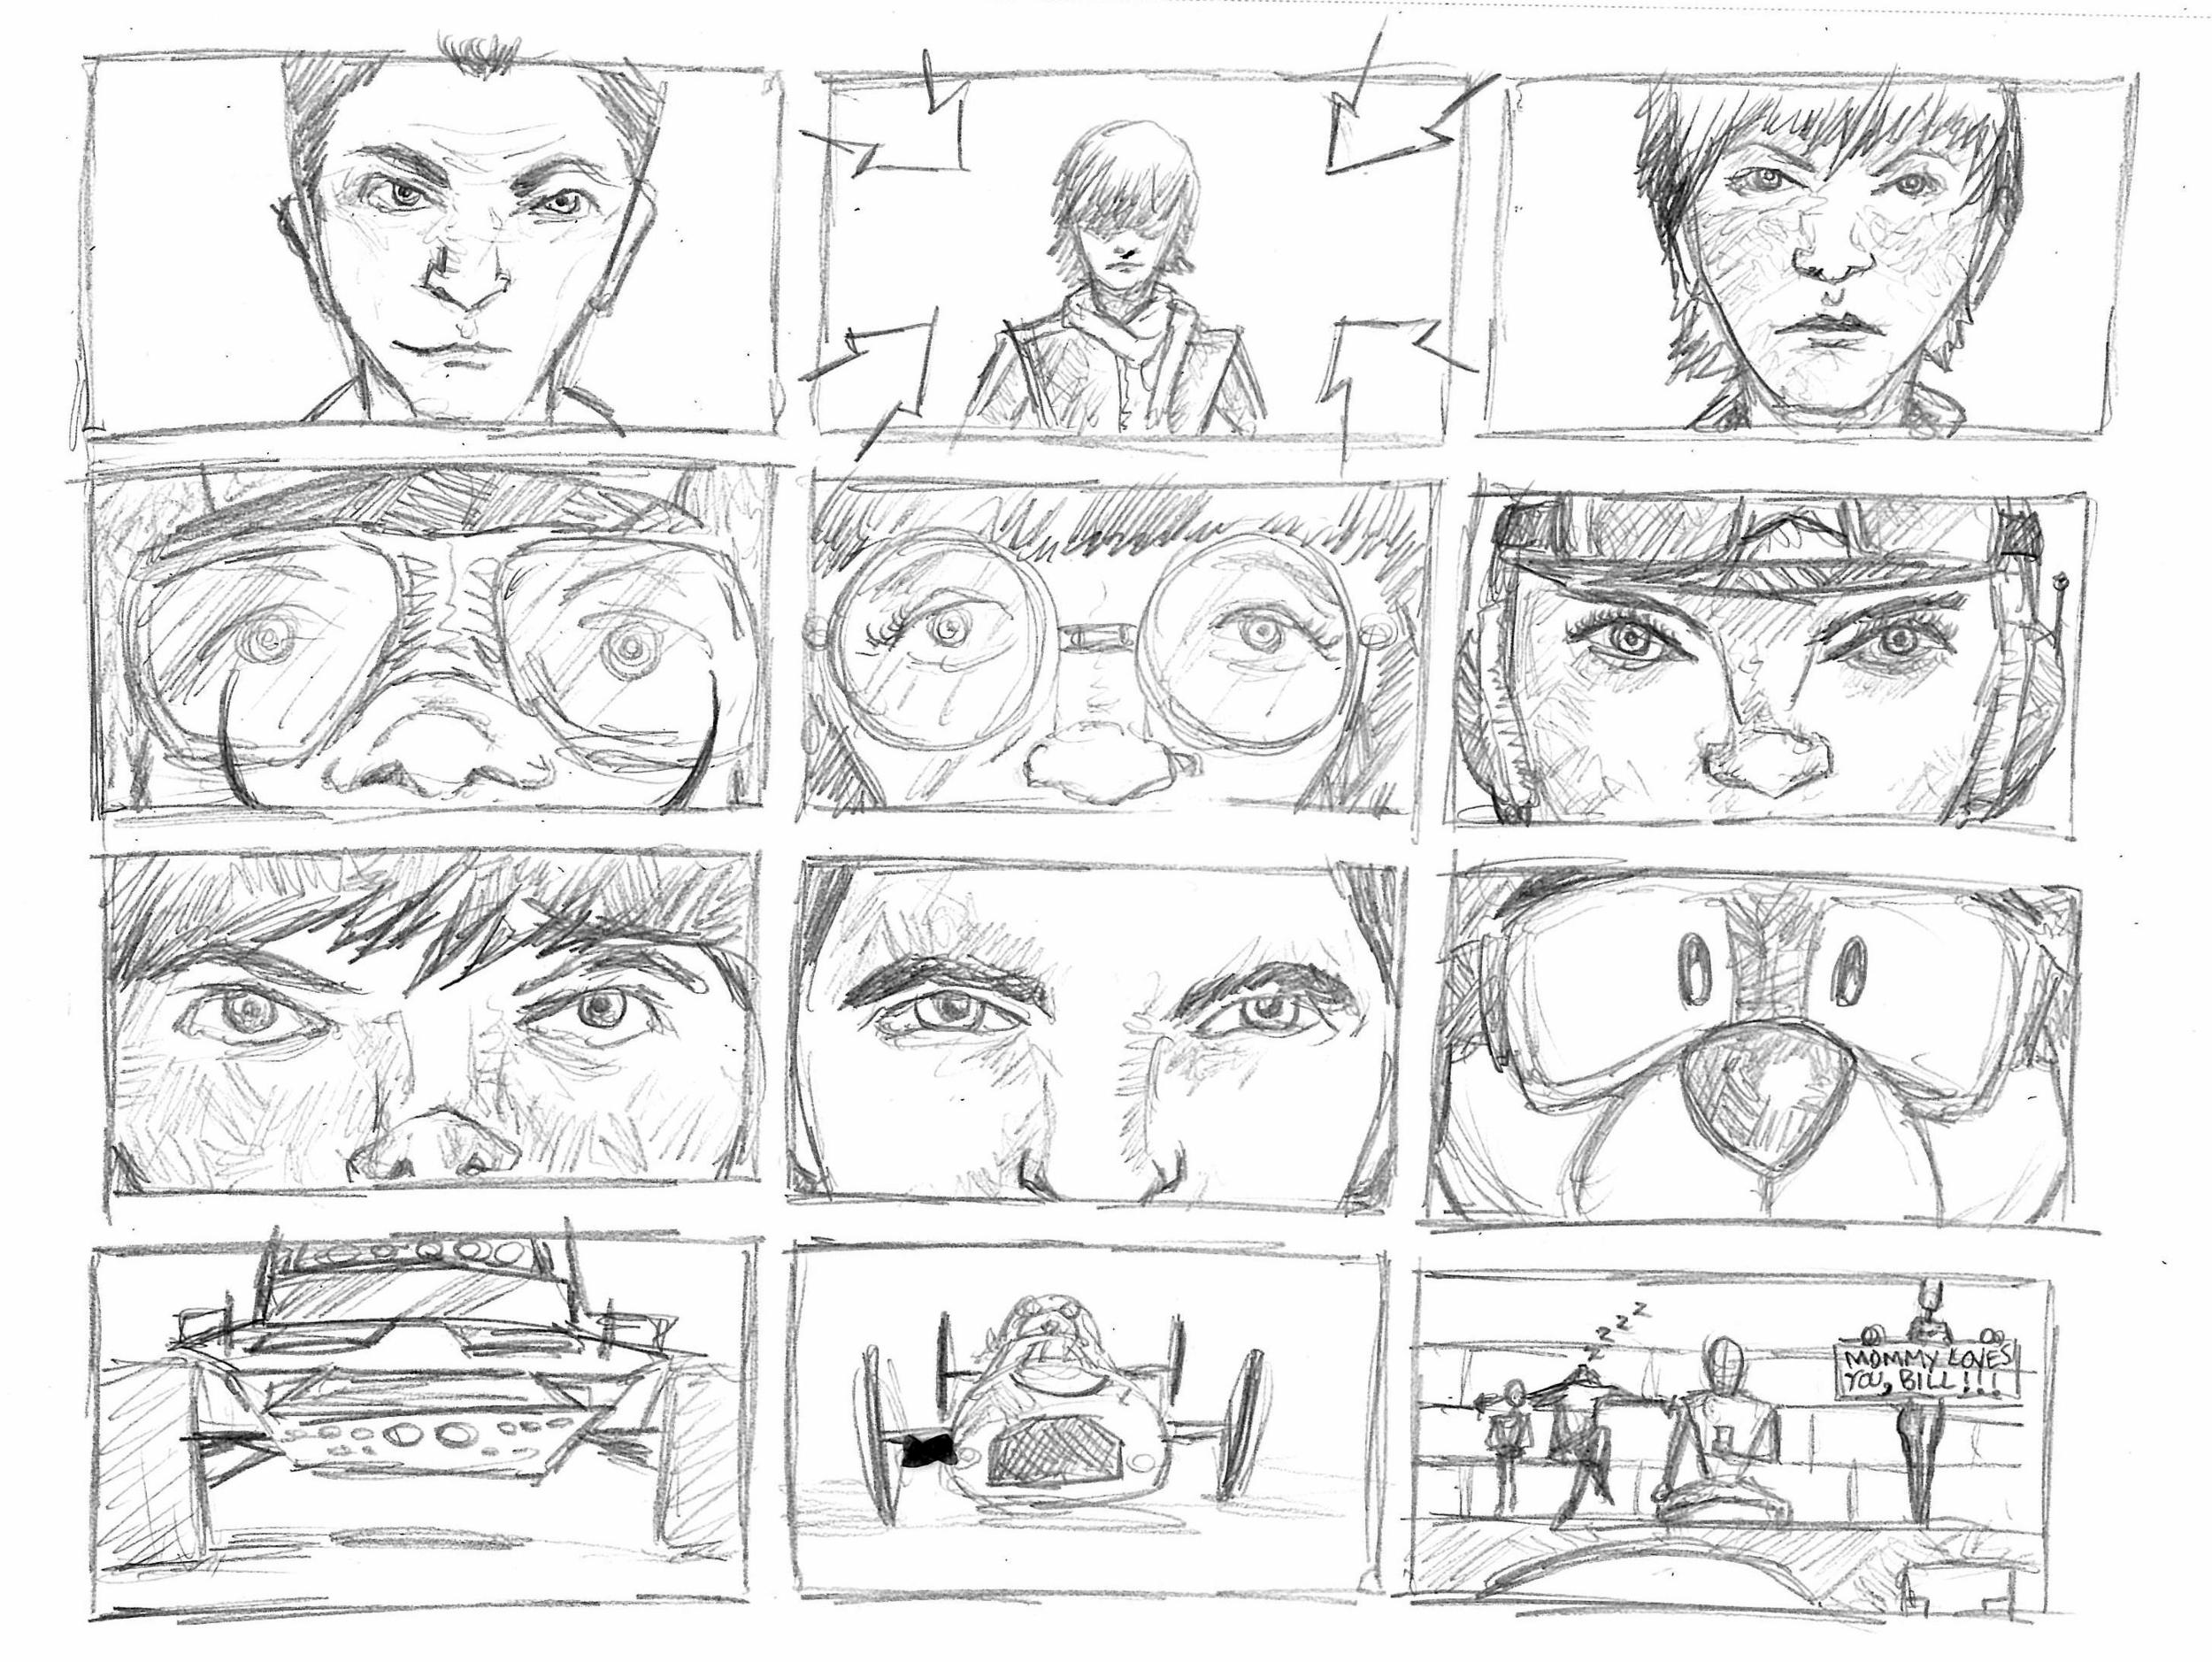 Prix Storyboard_PG016 - Film and TV - Jonathan B Perez - cREAtive Castle Studios.jpg